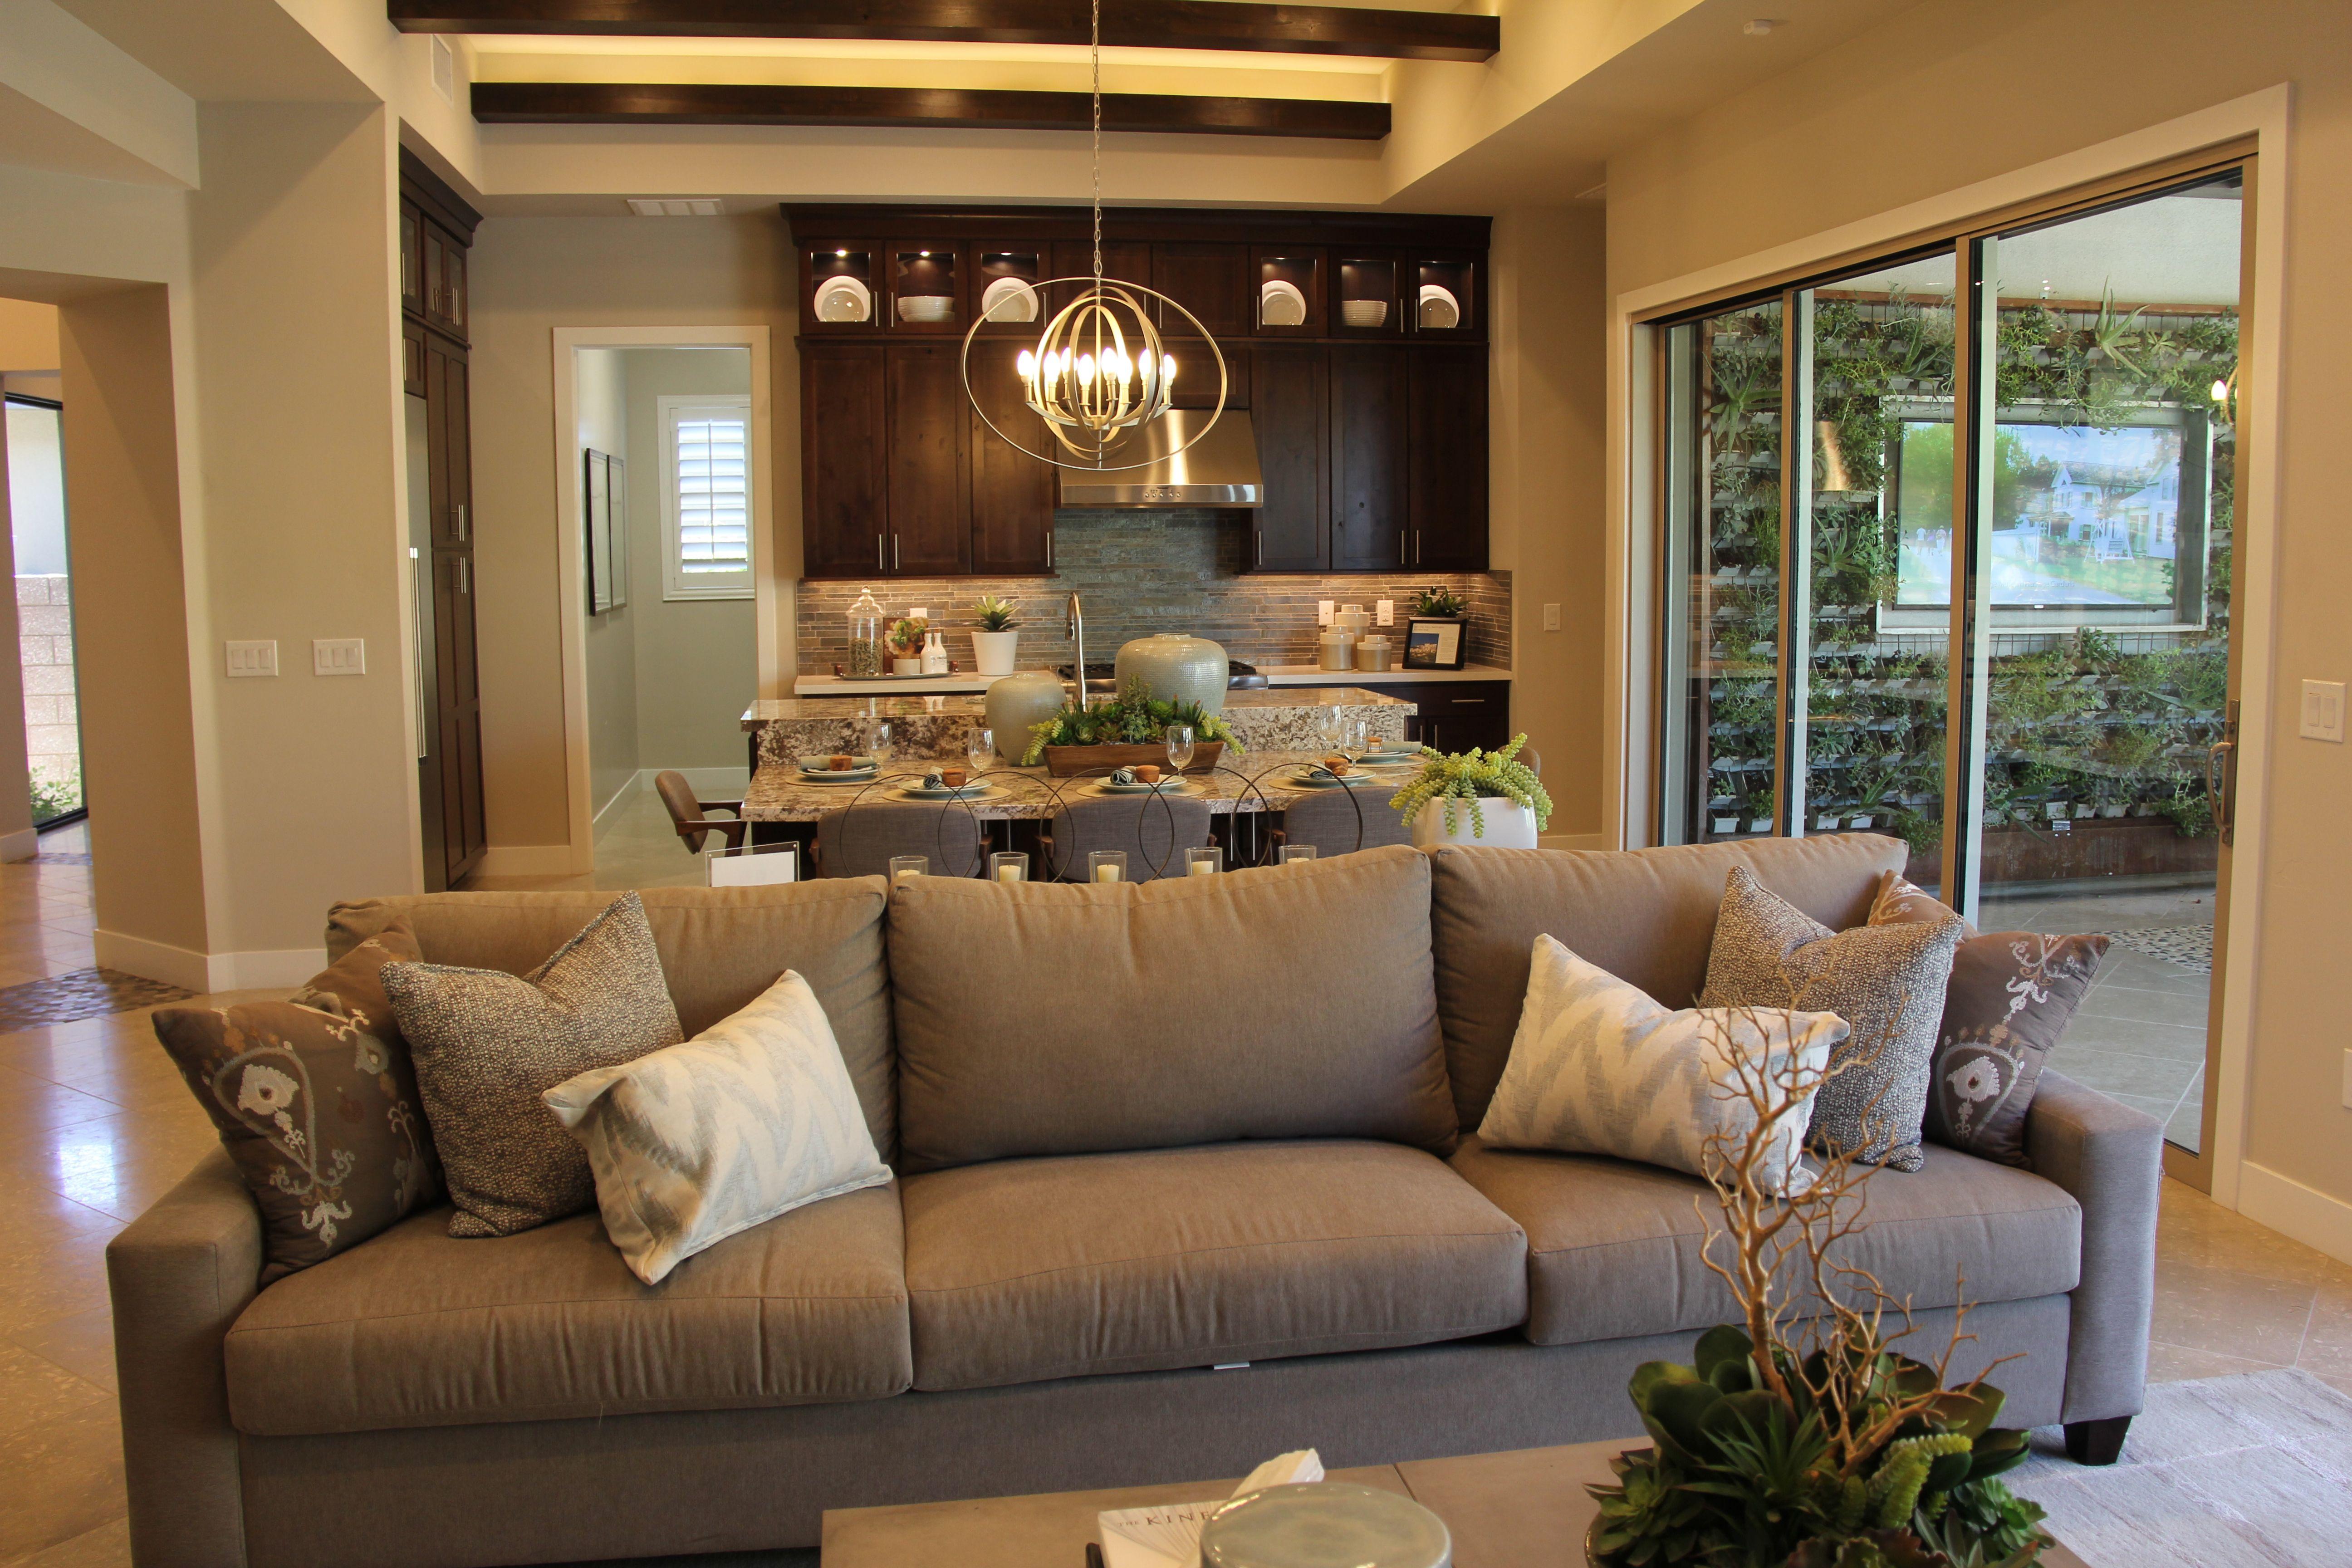 Gilmore model, living room | 55+ active adult communities ...